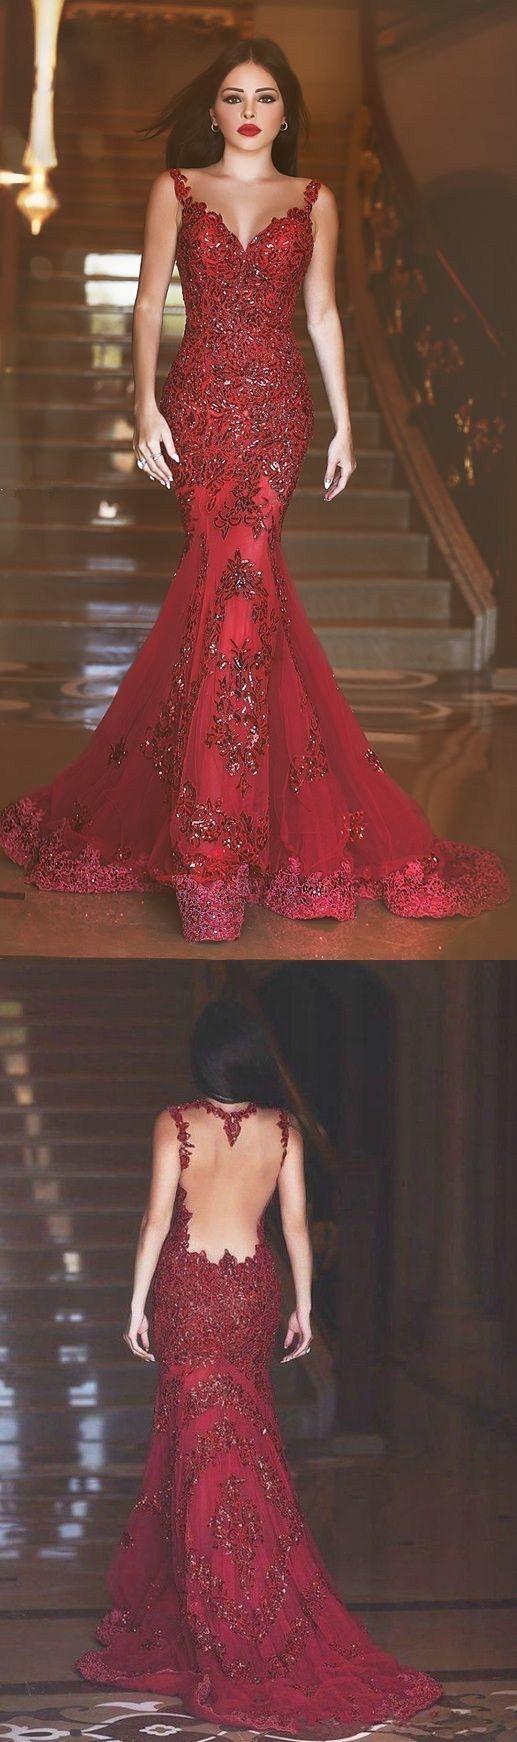 2017 prom dresses,long prom dresses,mermaid prom party dresses,lace prom dresses,sparkling prom party dresses,fashion,women's fashion,fashion style,prom dresses